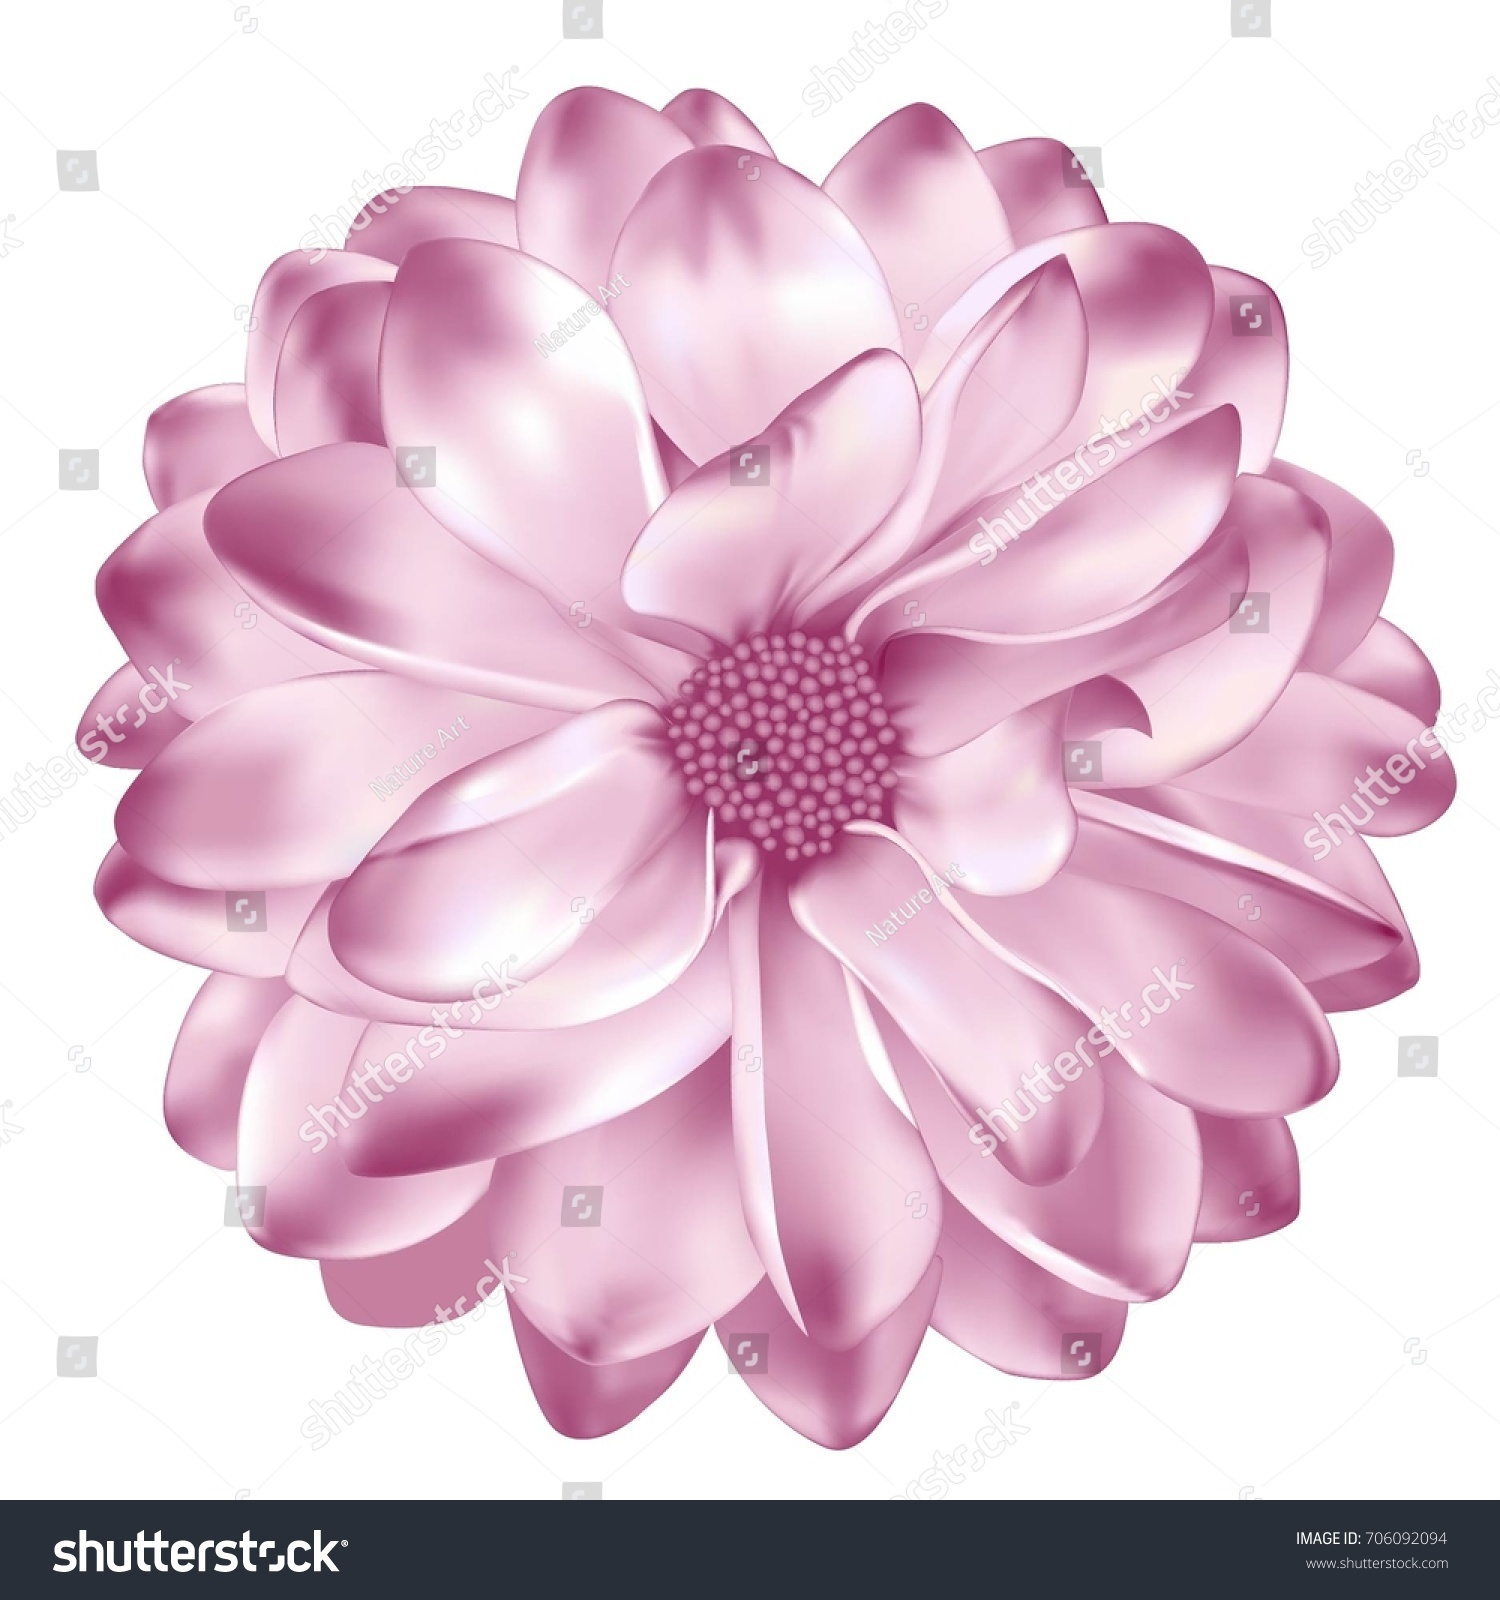 Mona lisa flower pink dahlia flower stock vector royalty free mona lisa flower pink dahlia flower spring gerber flowerolated on white background izmirmasajfo